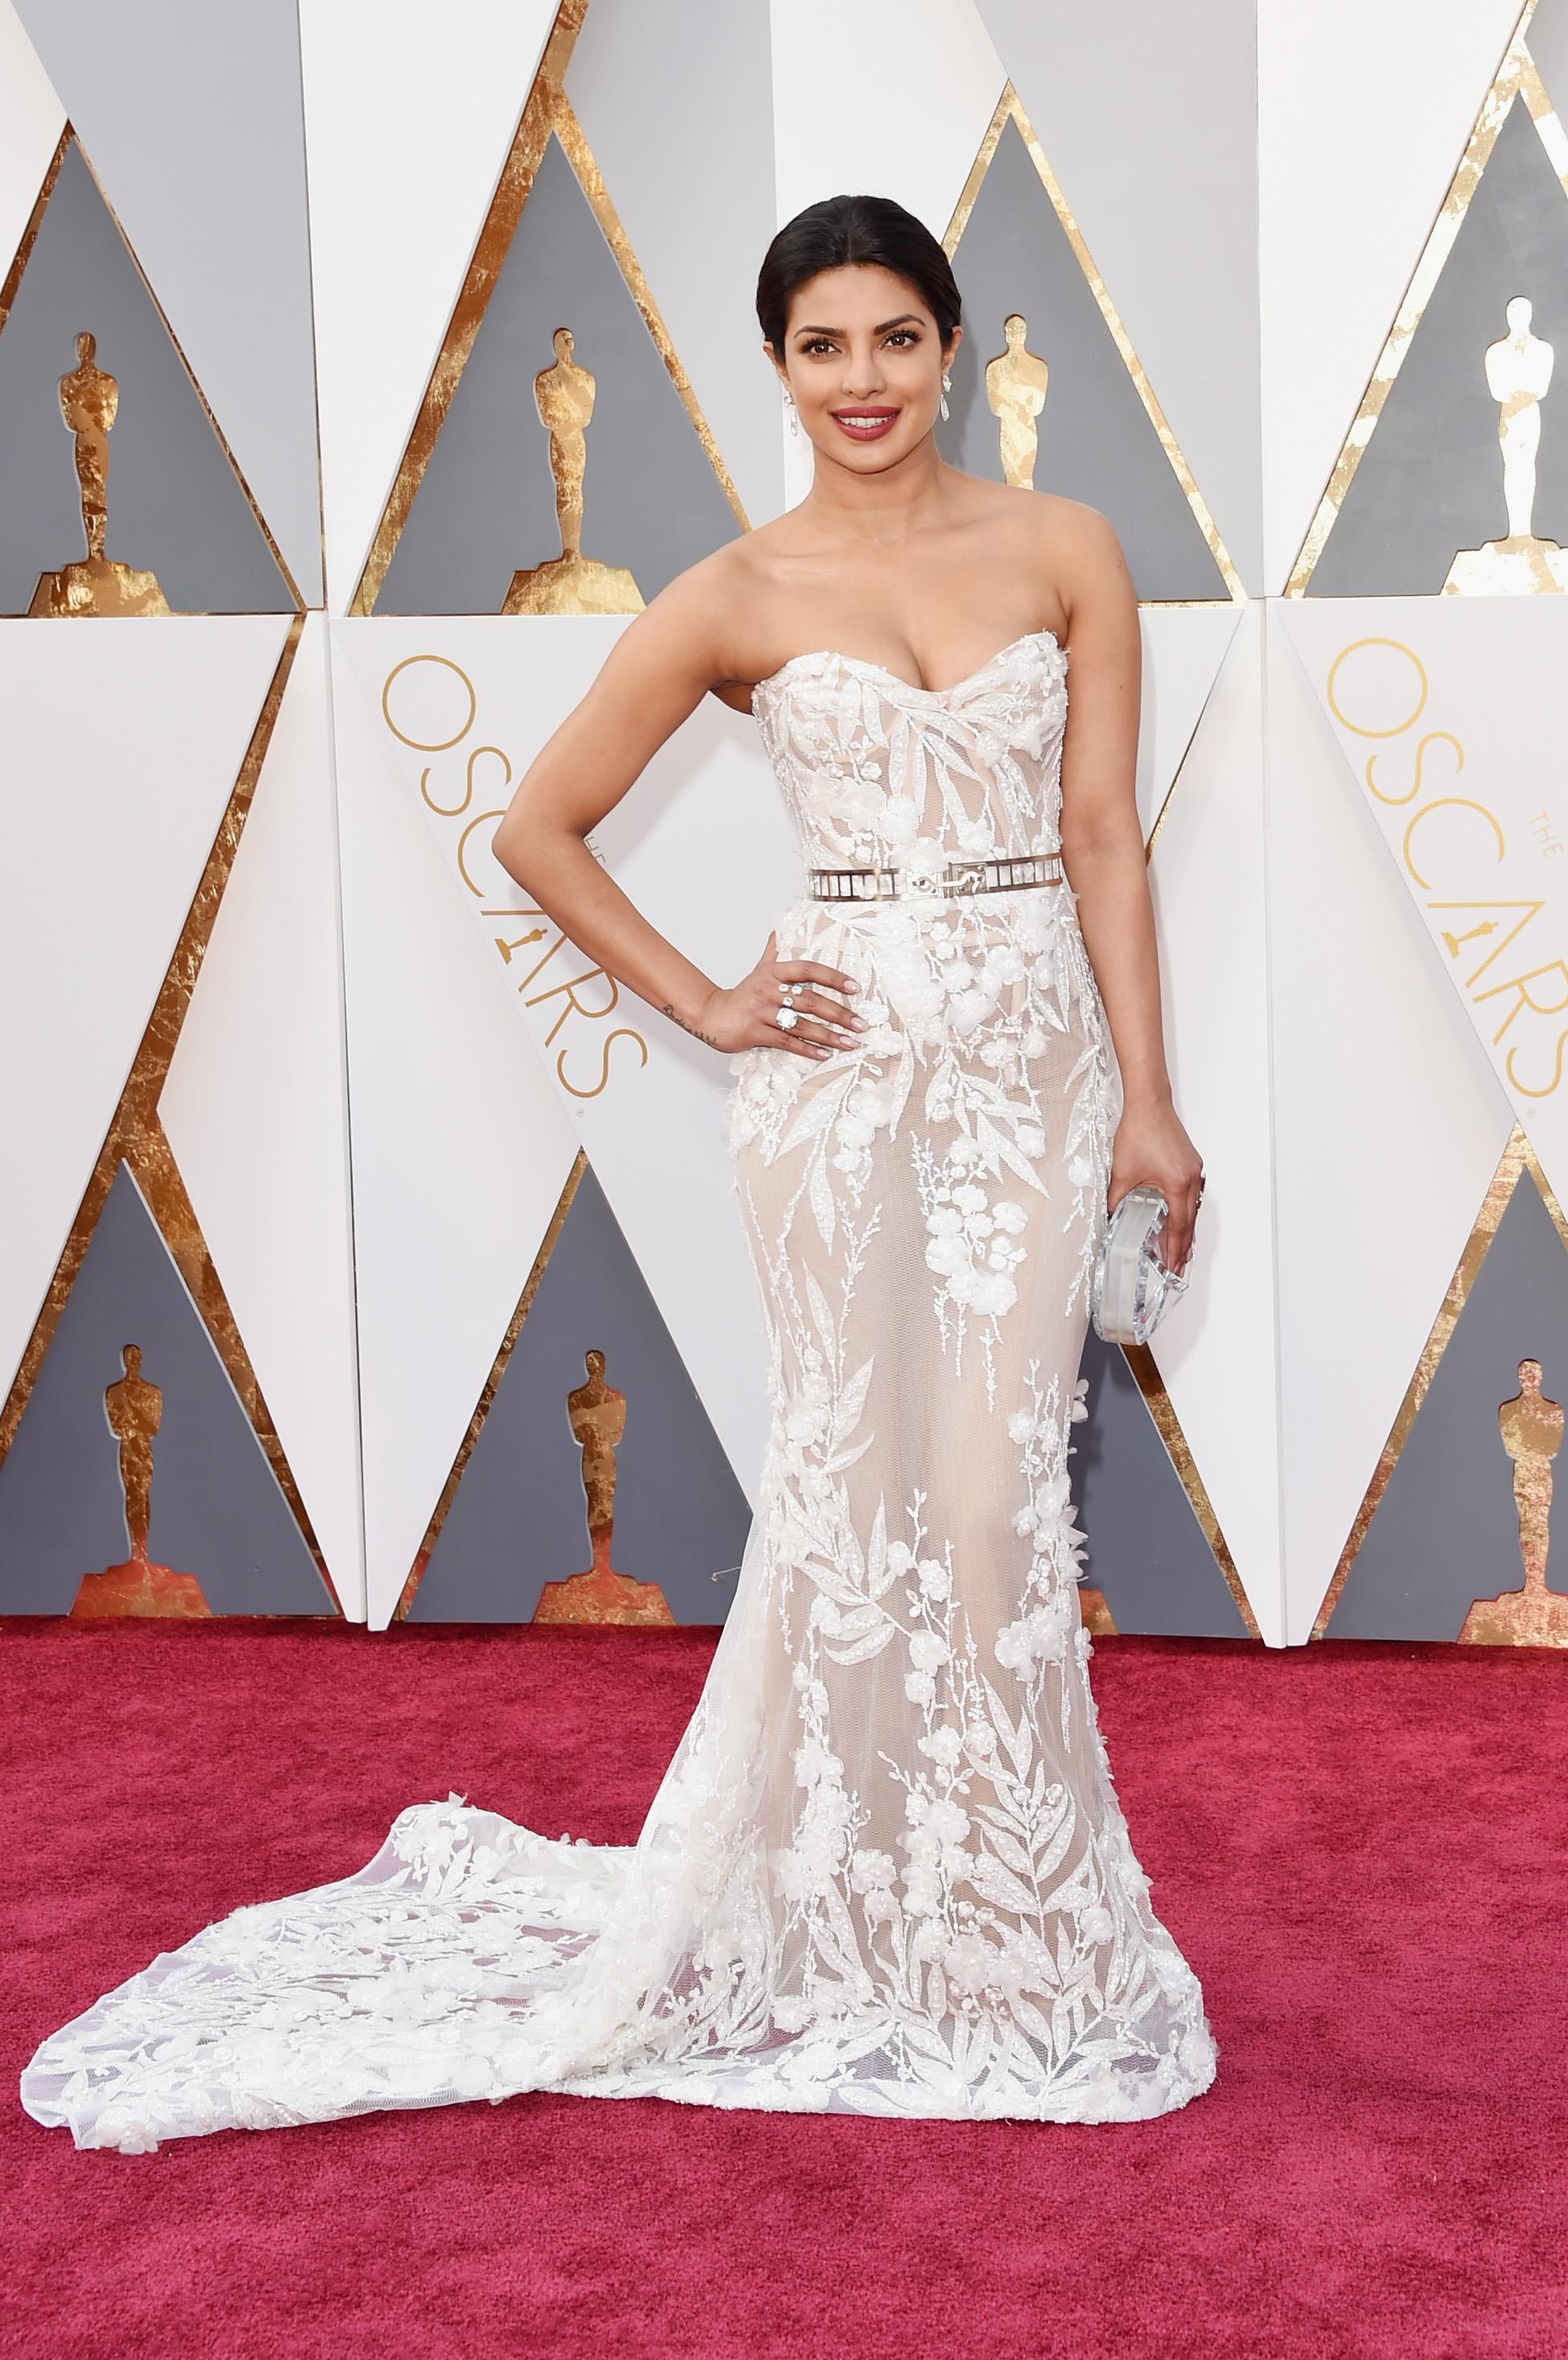 Priyanka Chopra Oscars The Most Revealing Dresses Of